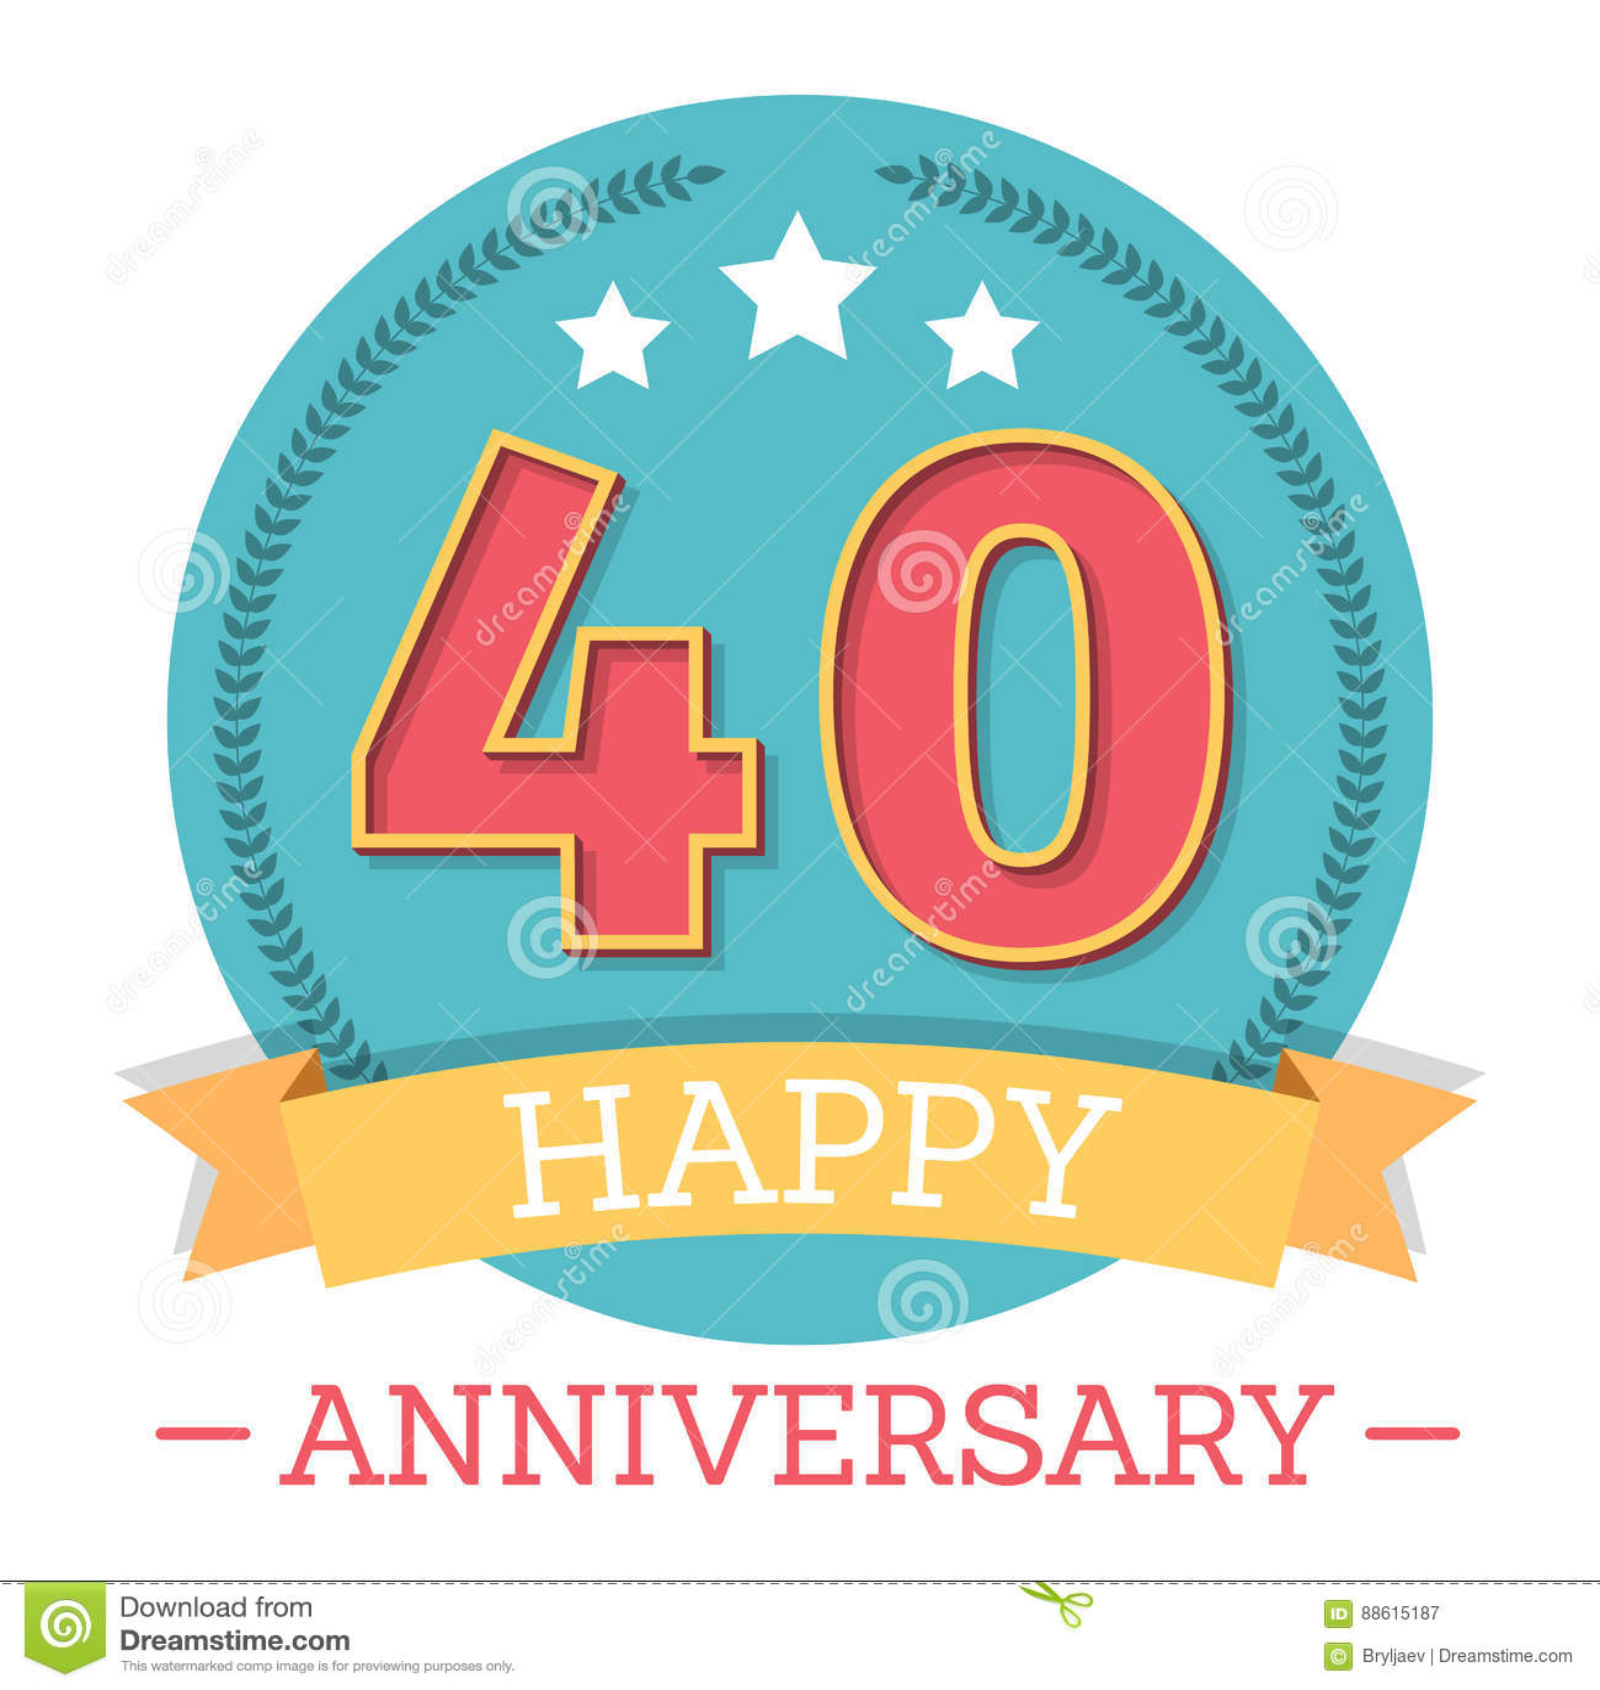 40 Years Anniversary Emblem